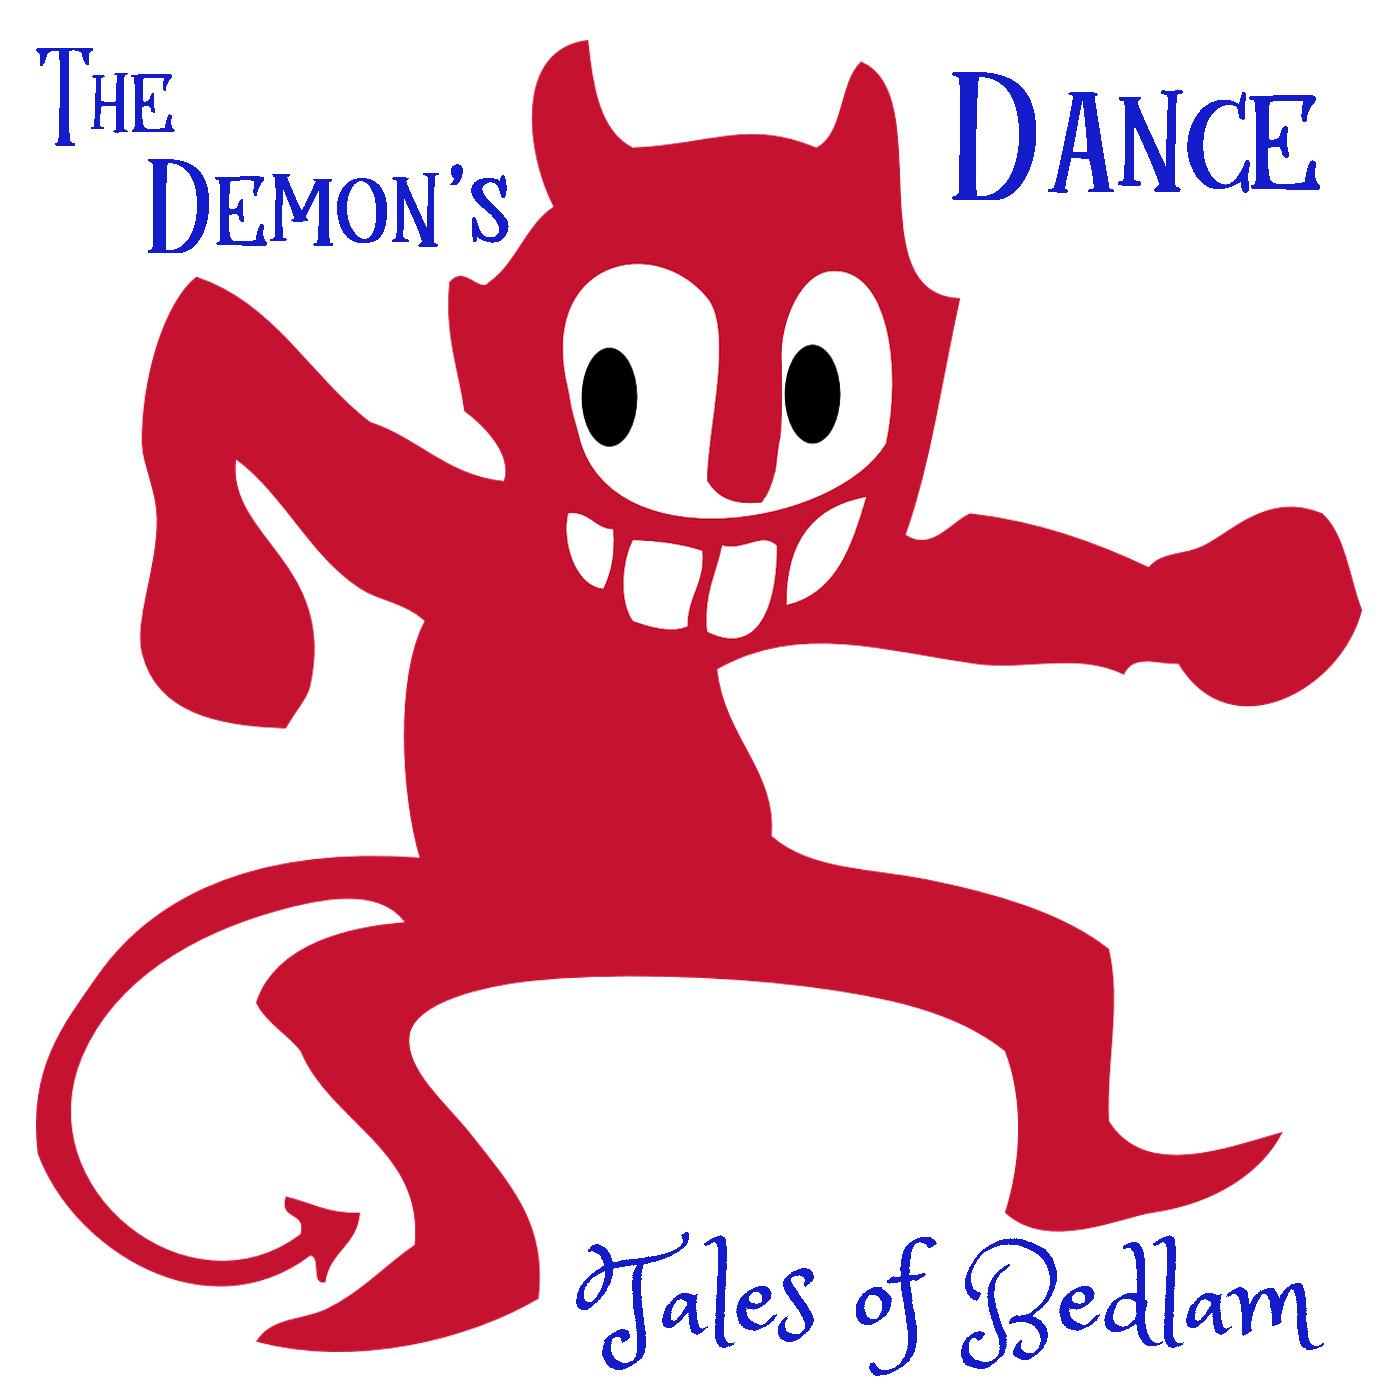 the_demon's_dance.jpg